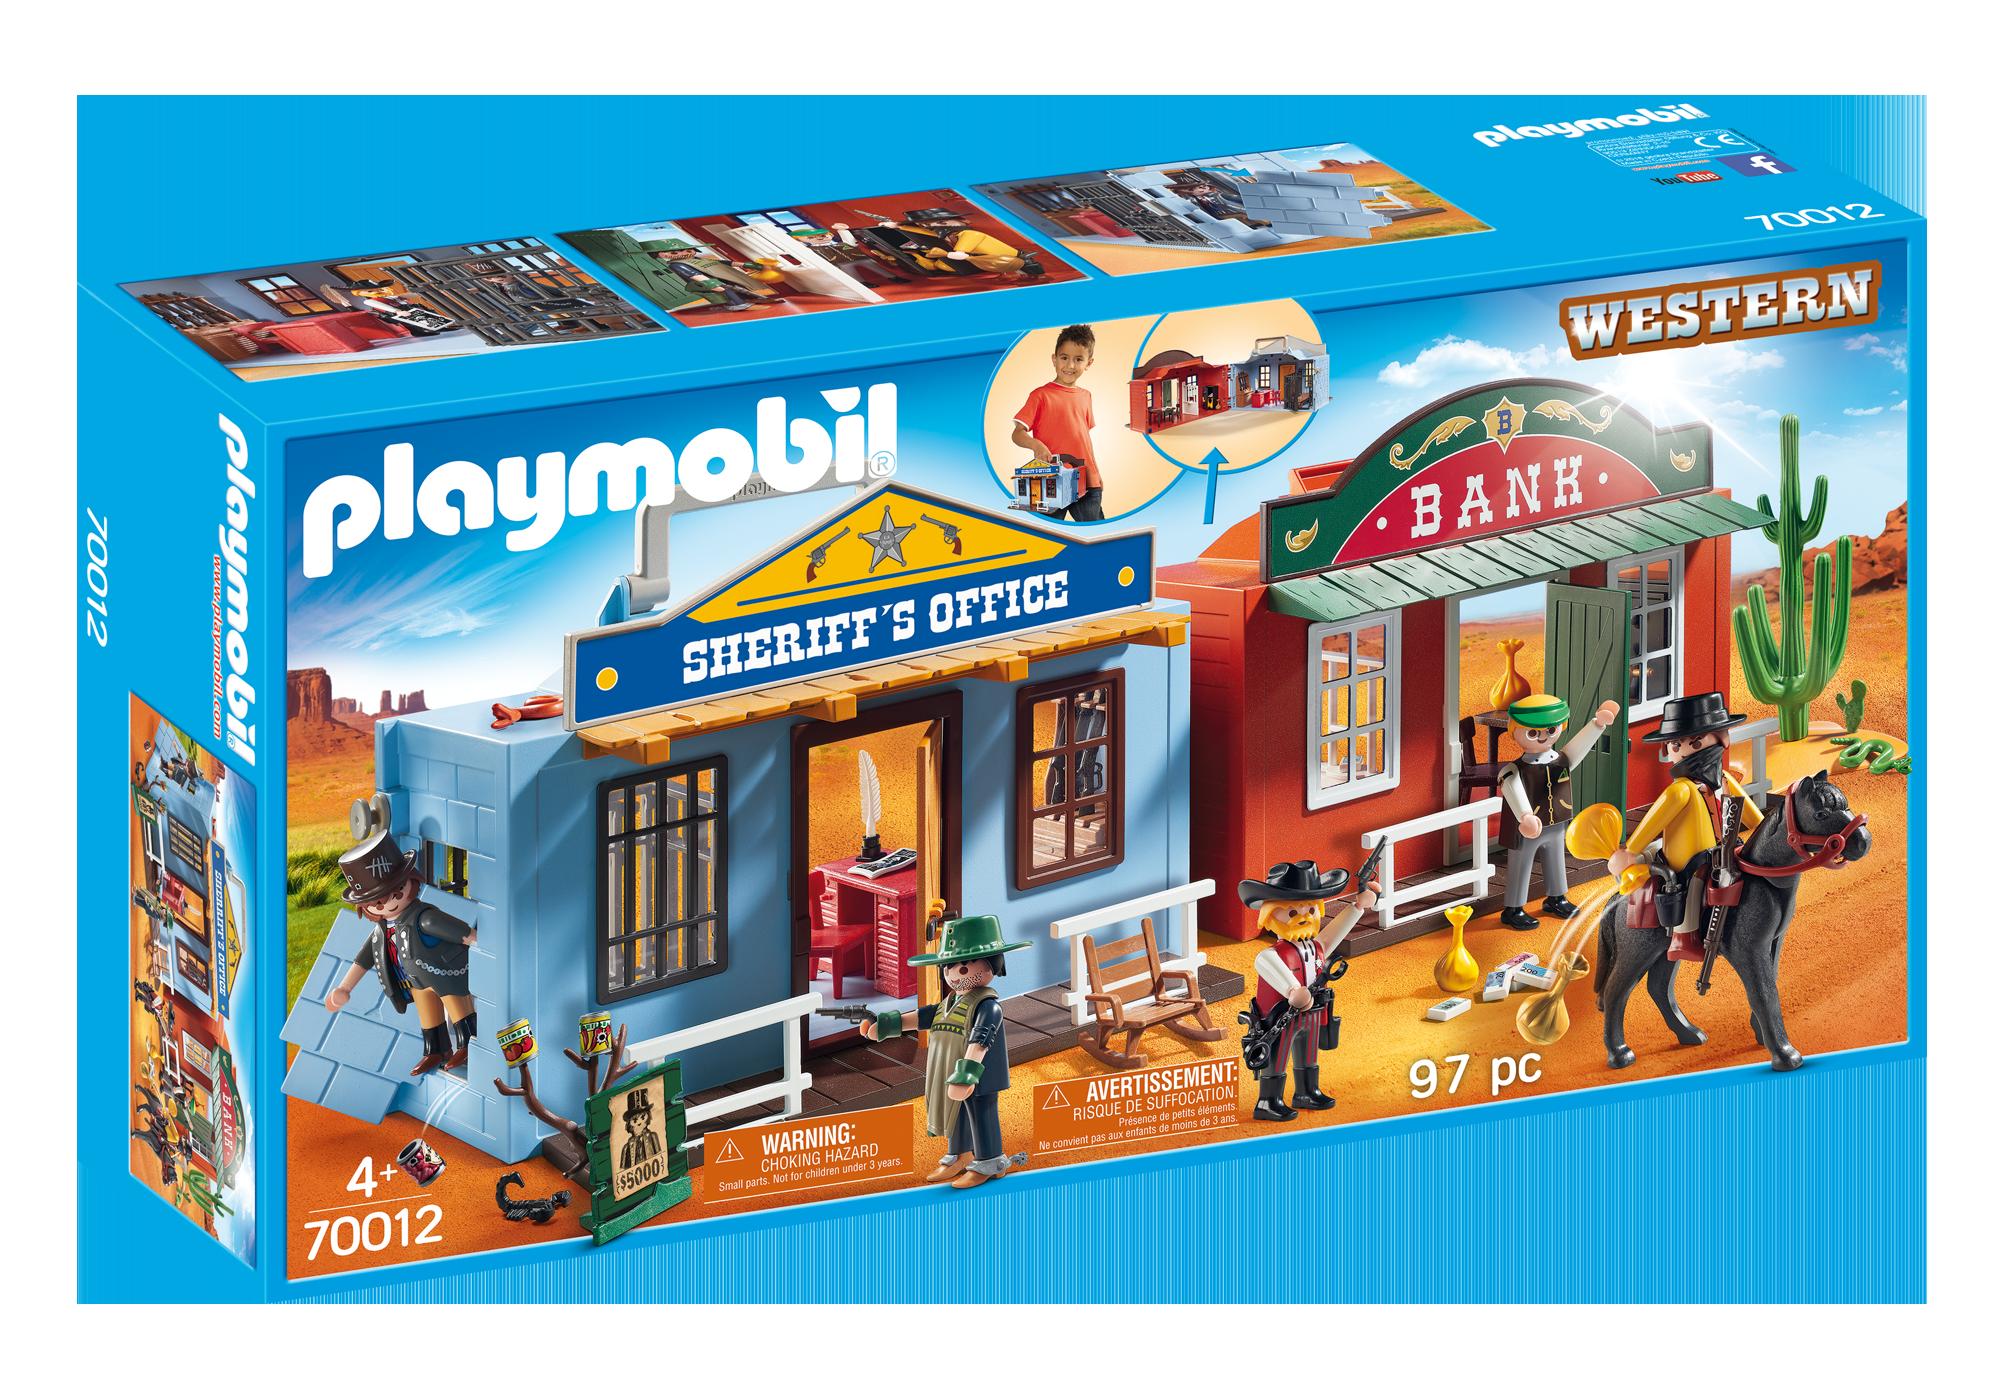 http://media.playmobil.com/i/playmobil/70012_product_box_front/Mitnehm-Westerncity